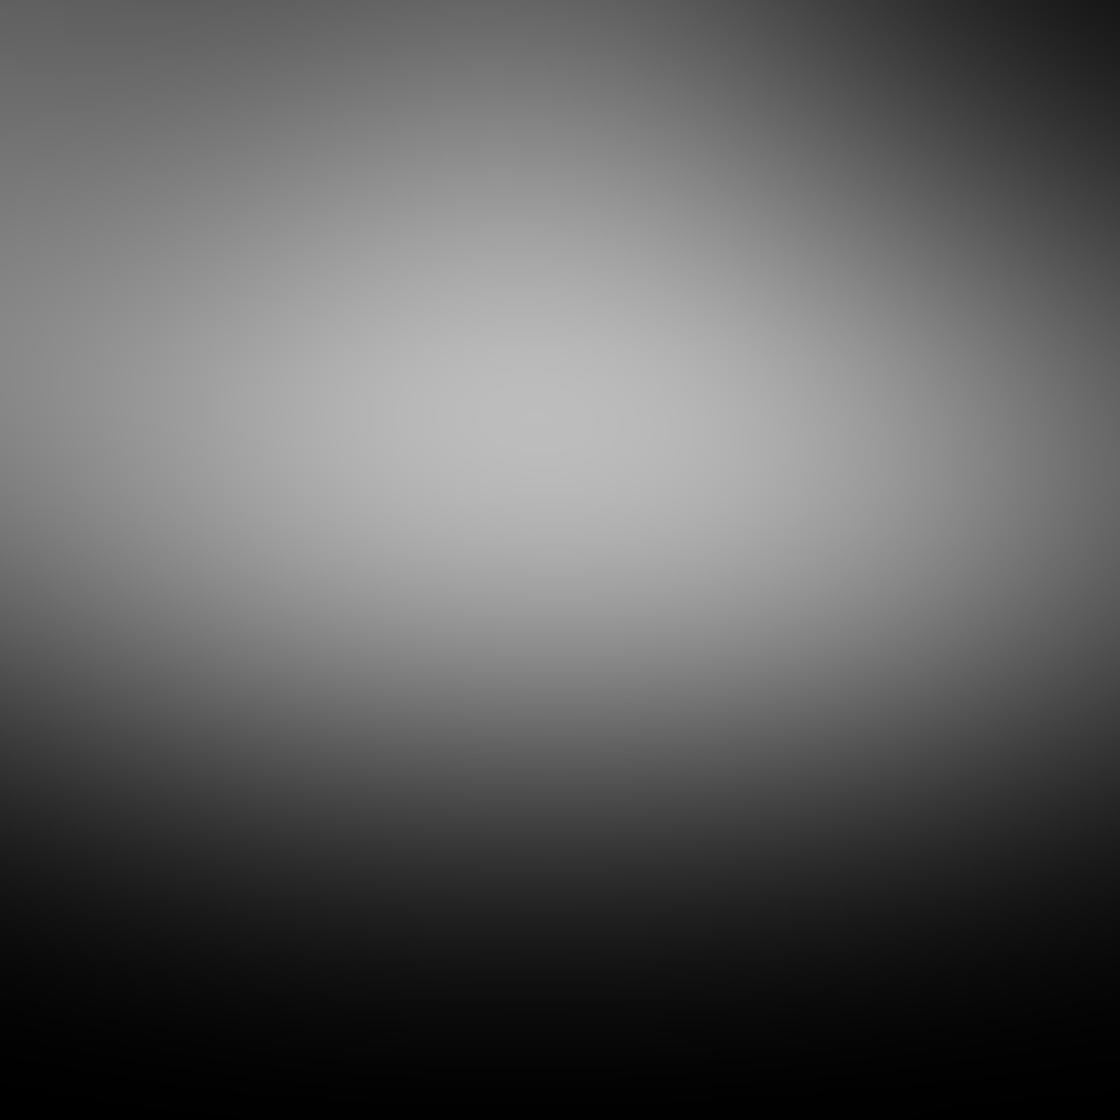 iPhone Photo Vignette 59